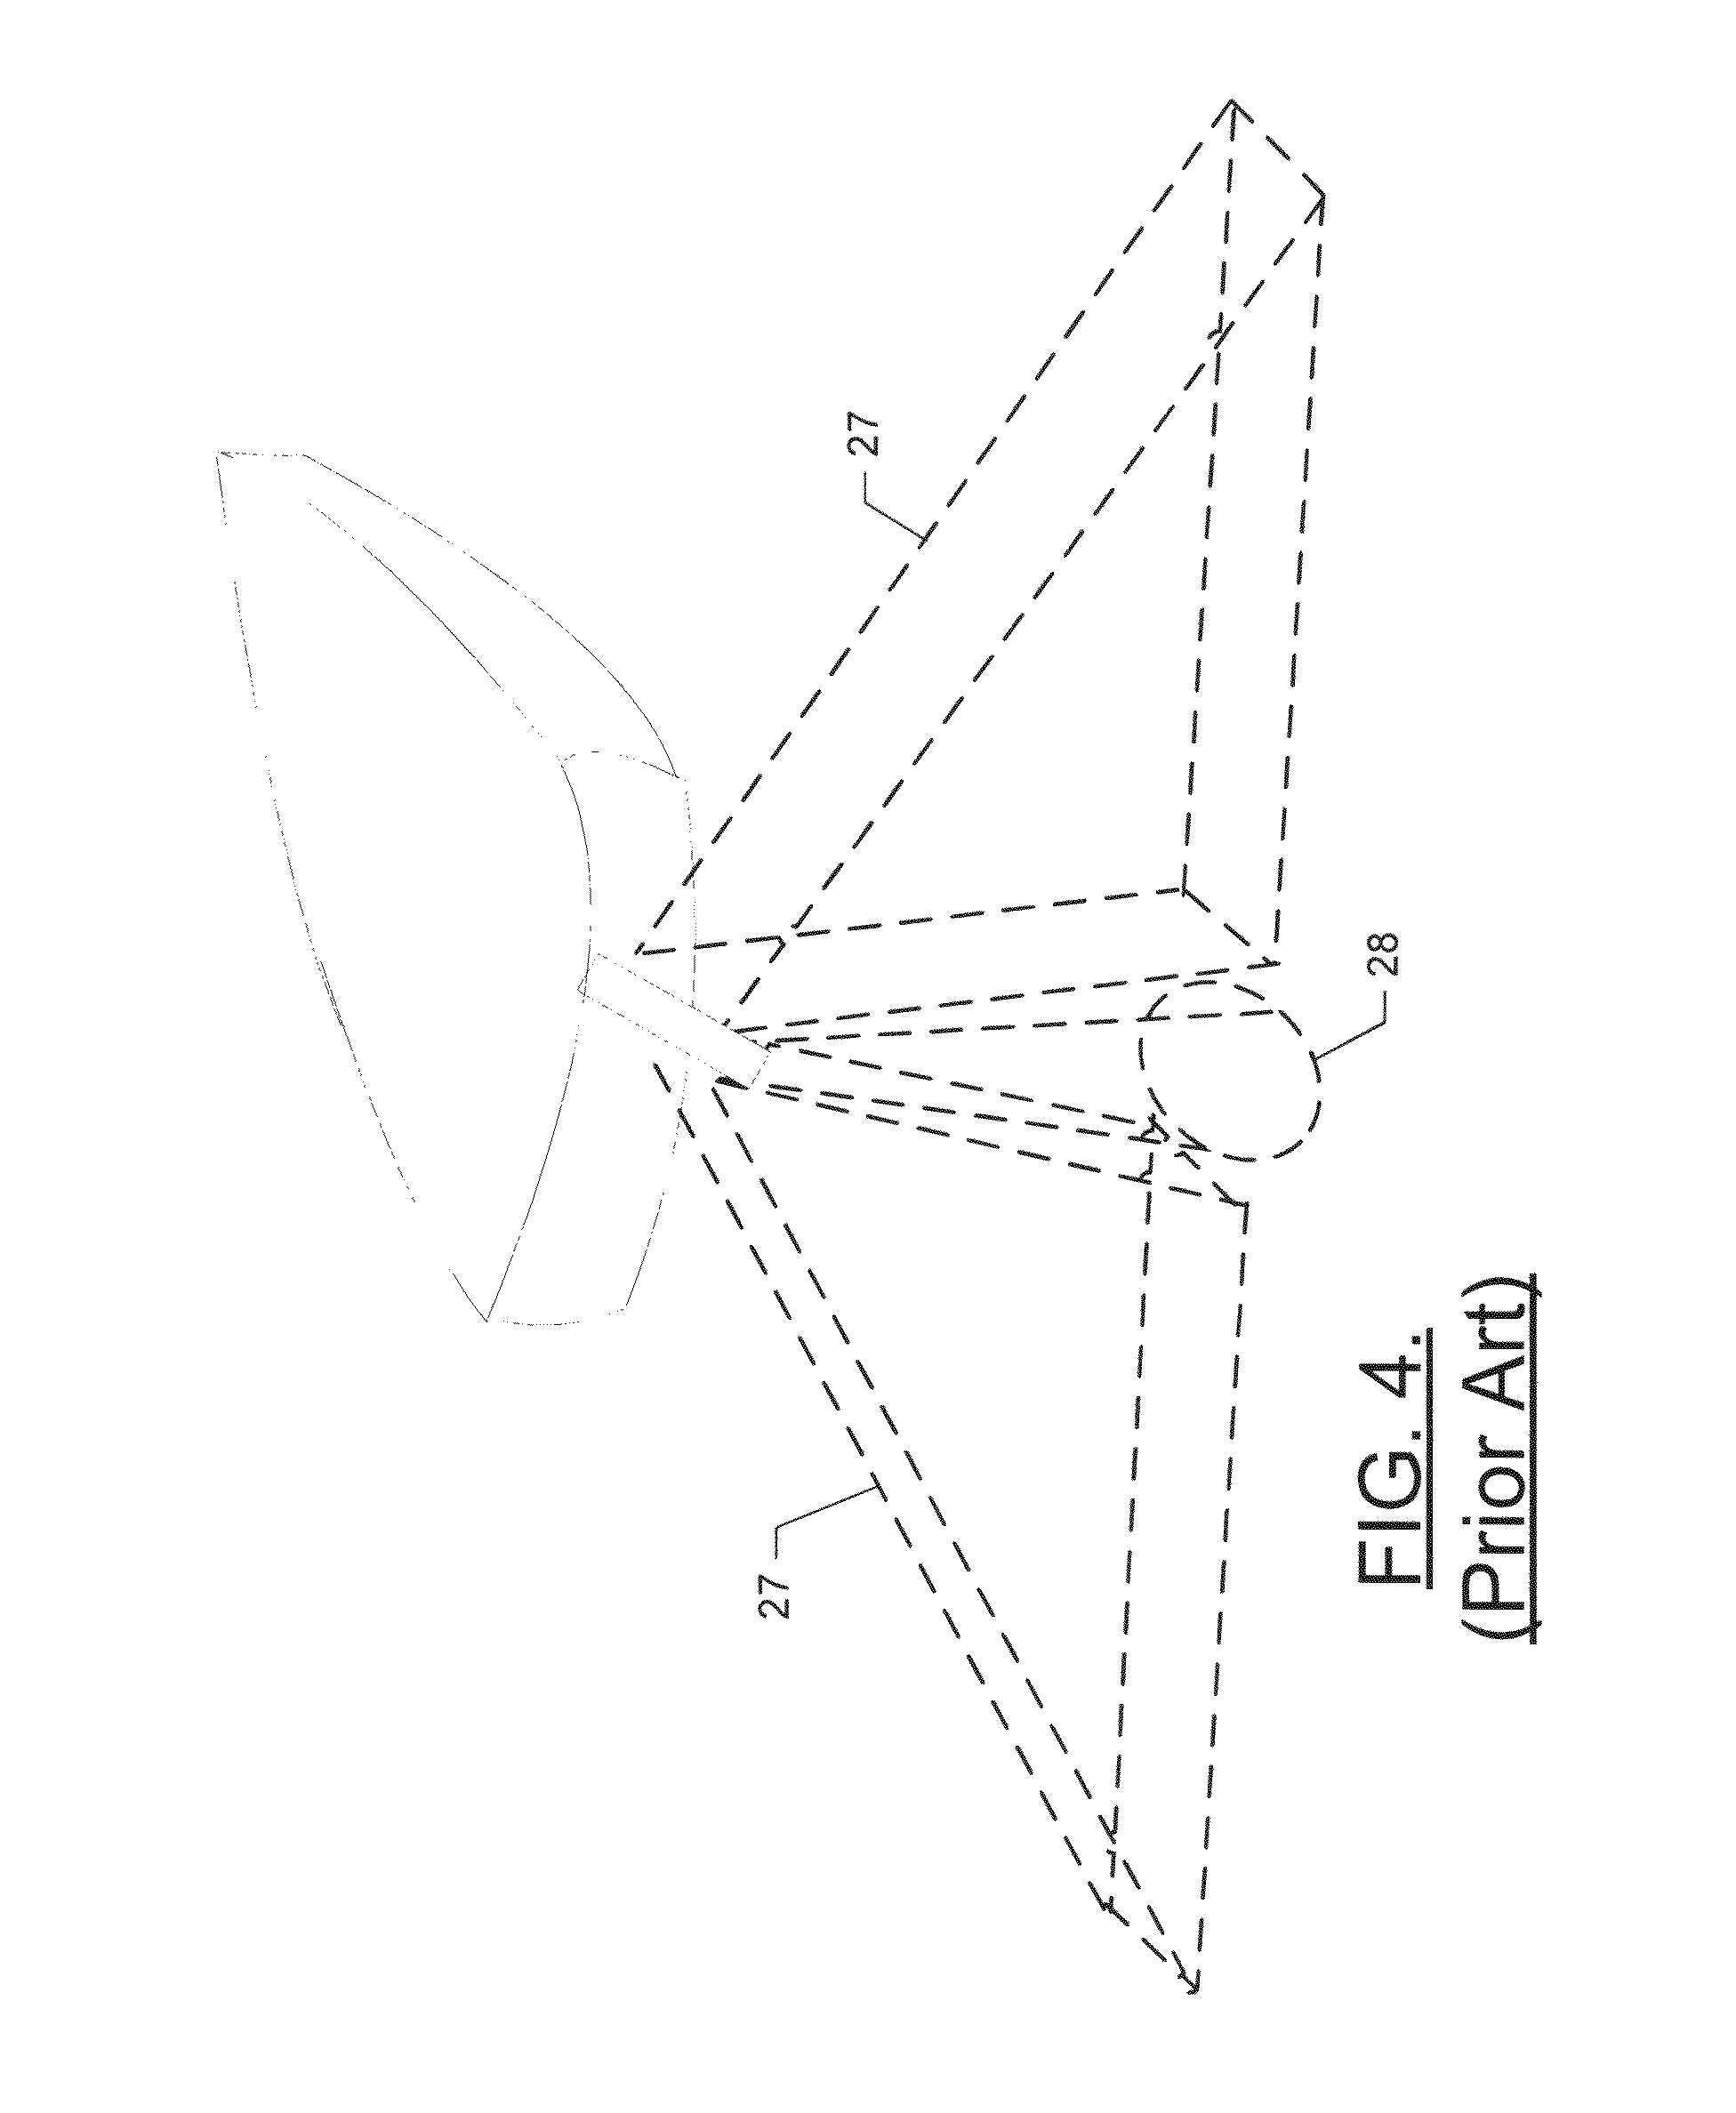 1990 Eagle Talon Wiring Diagram S Similiar Dodge Viper Geo Storm 95 Vision